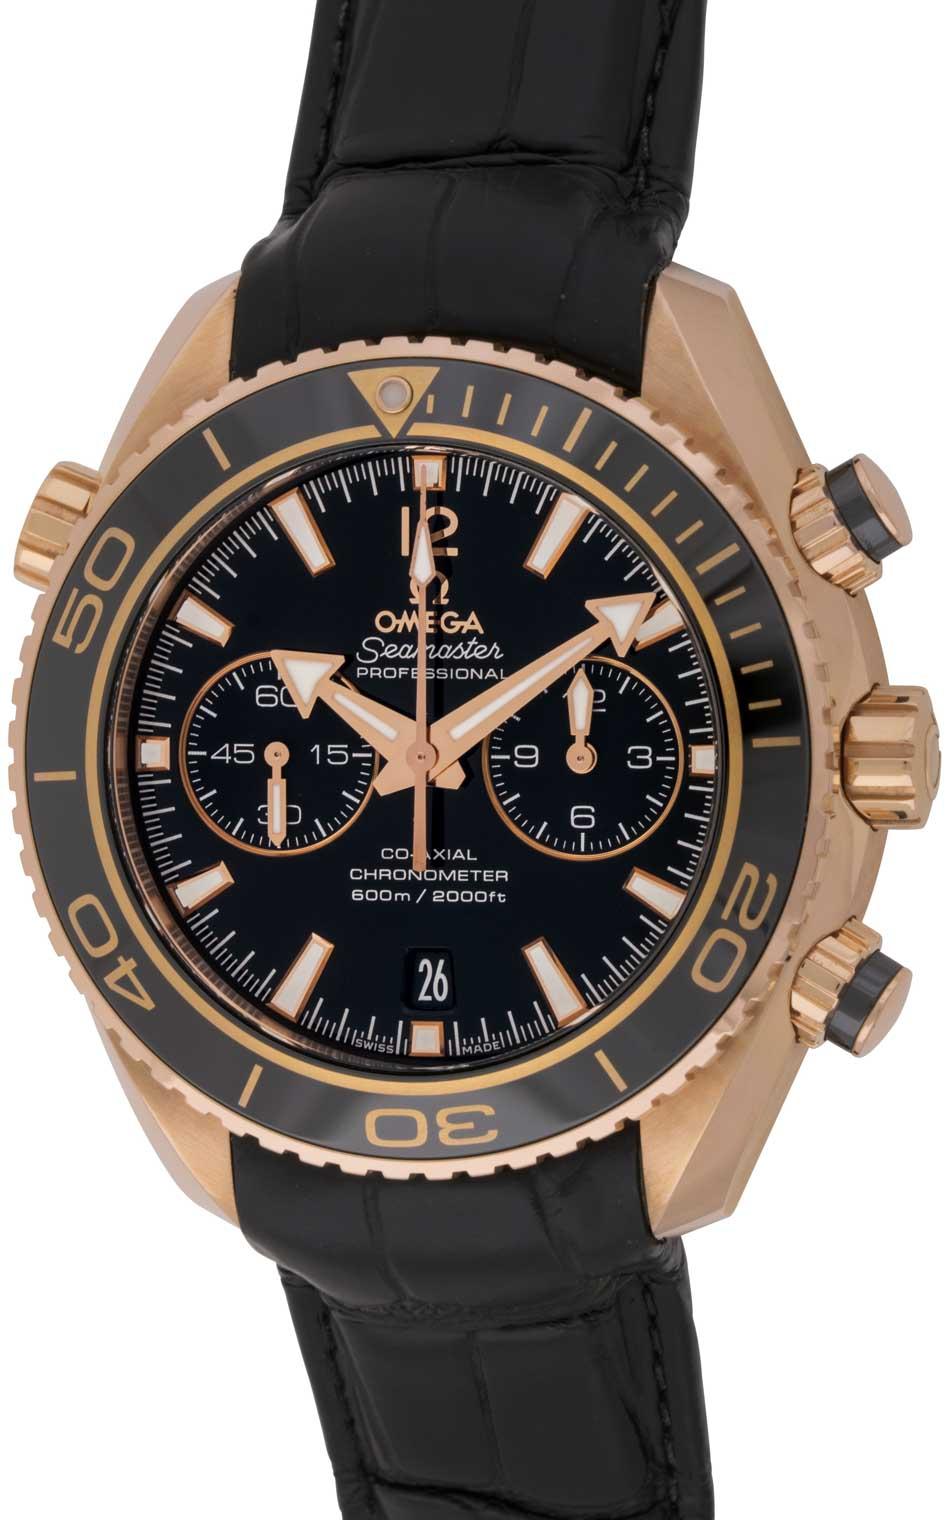 Omega - Seamaster Planet Ocean Chronograph   232.63.46.51.01.001 ... b81c05bfcd